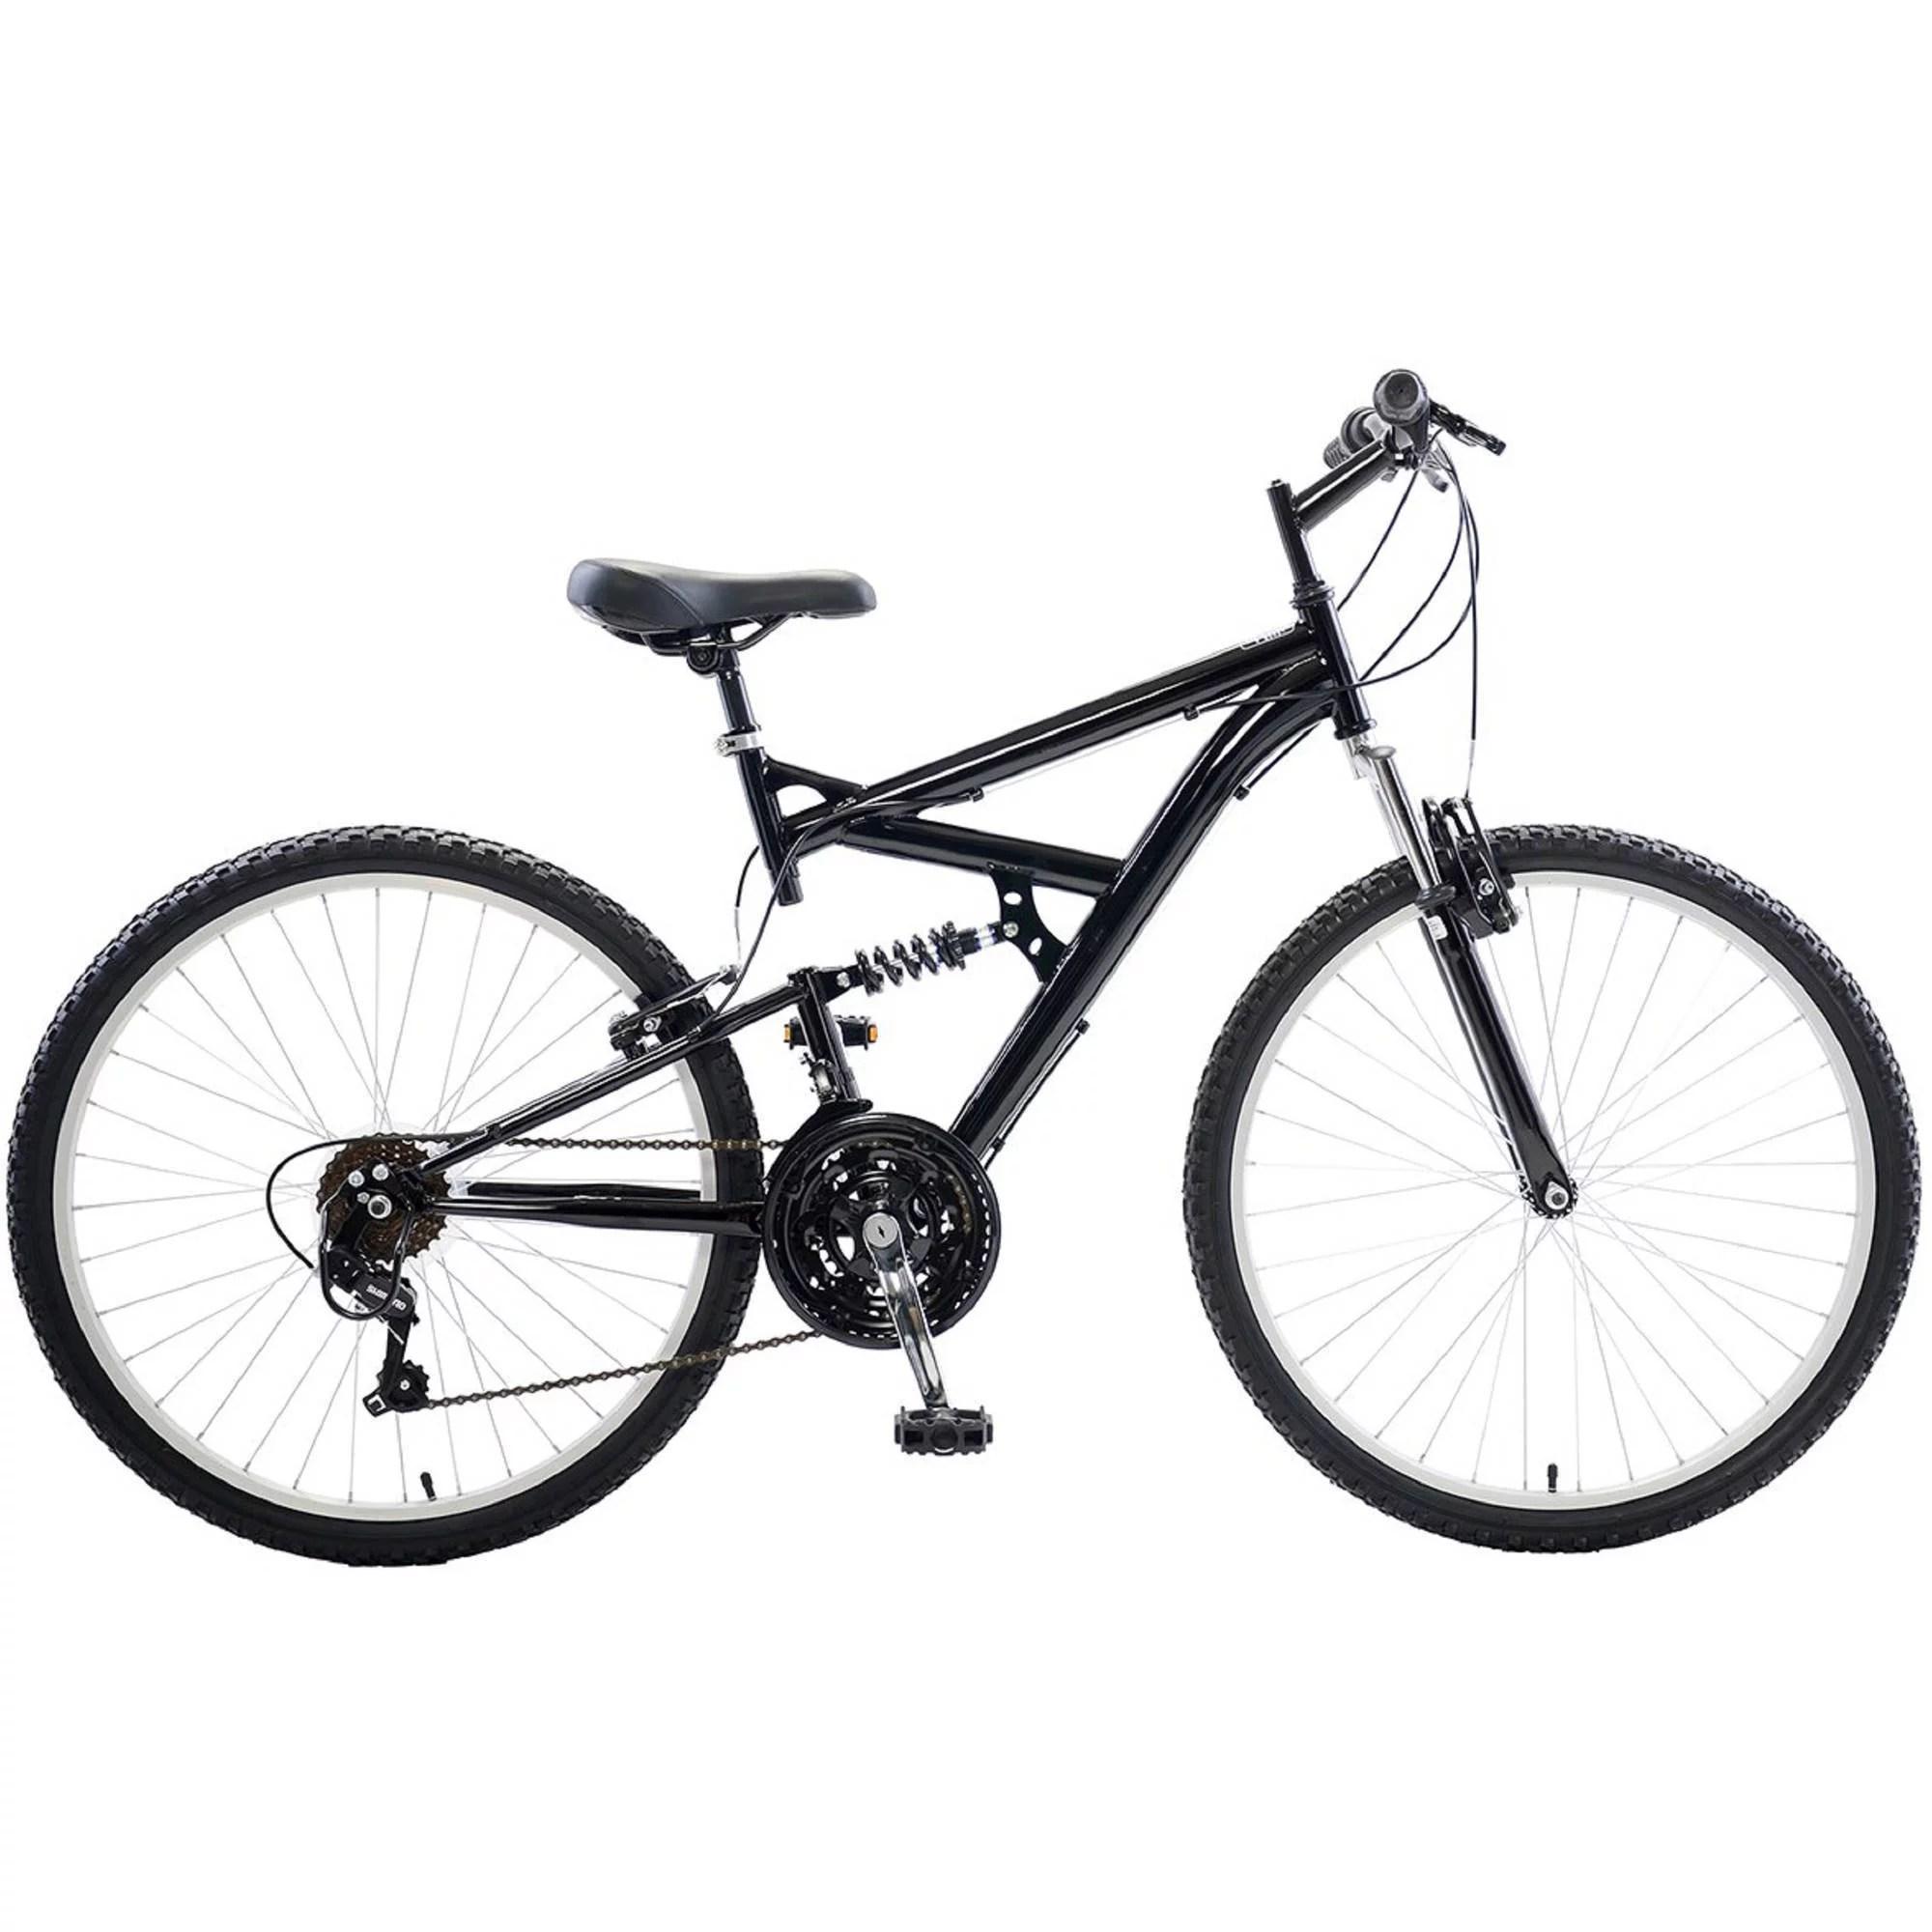 Dual Suspension Mountain Bike 26 In Wheels 18 In Frame